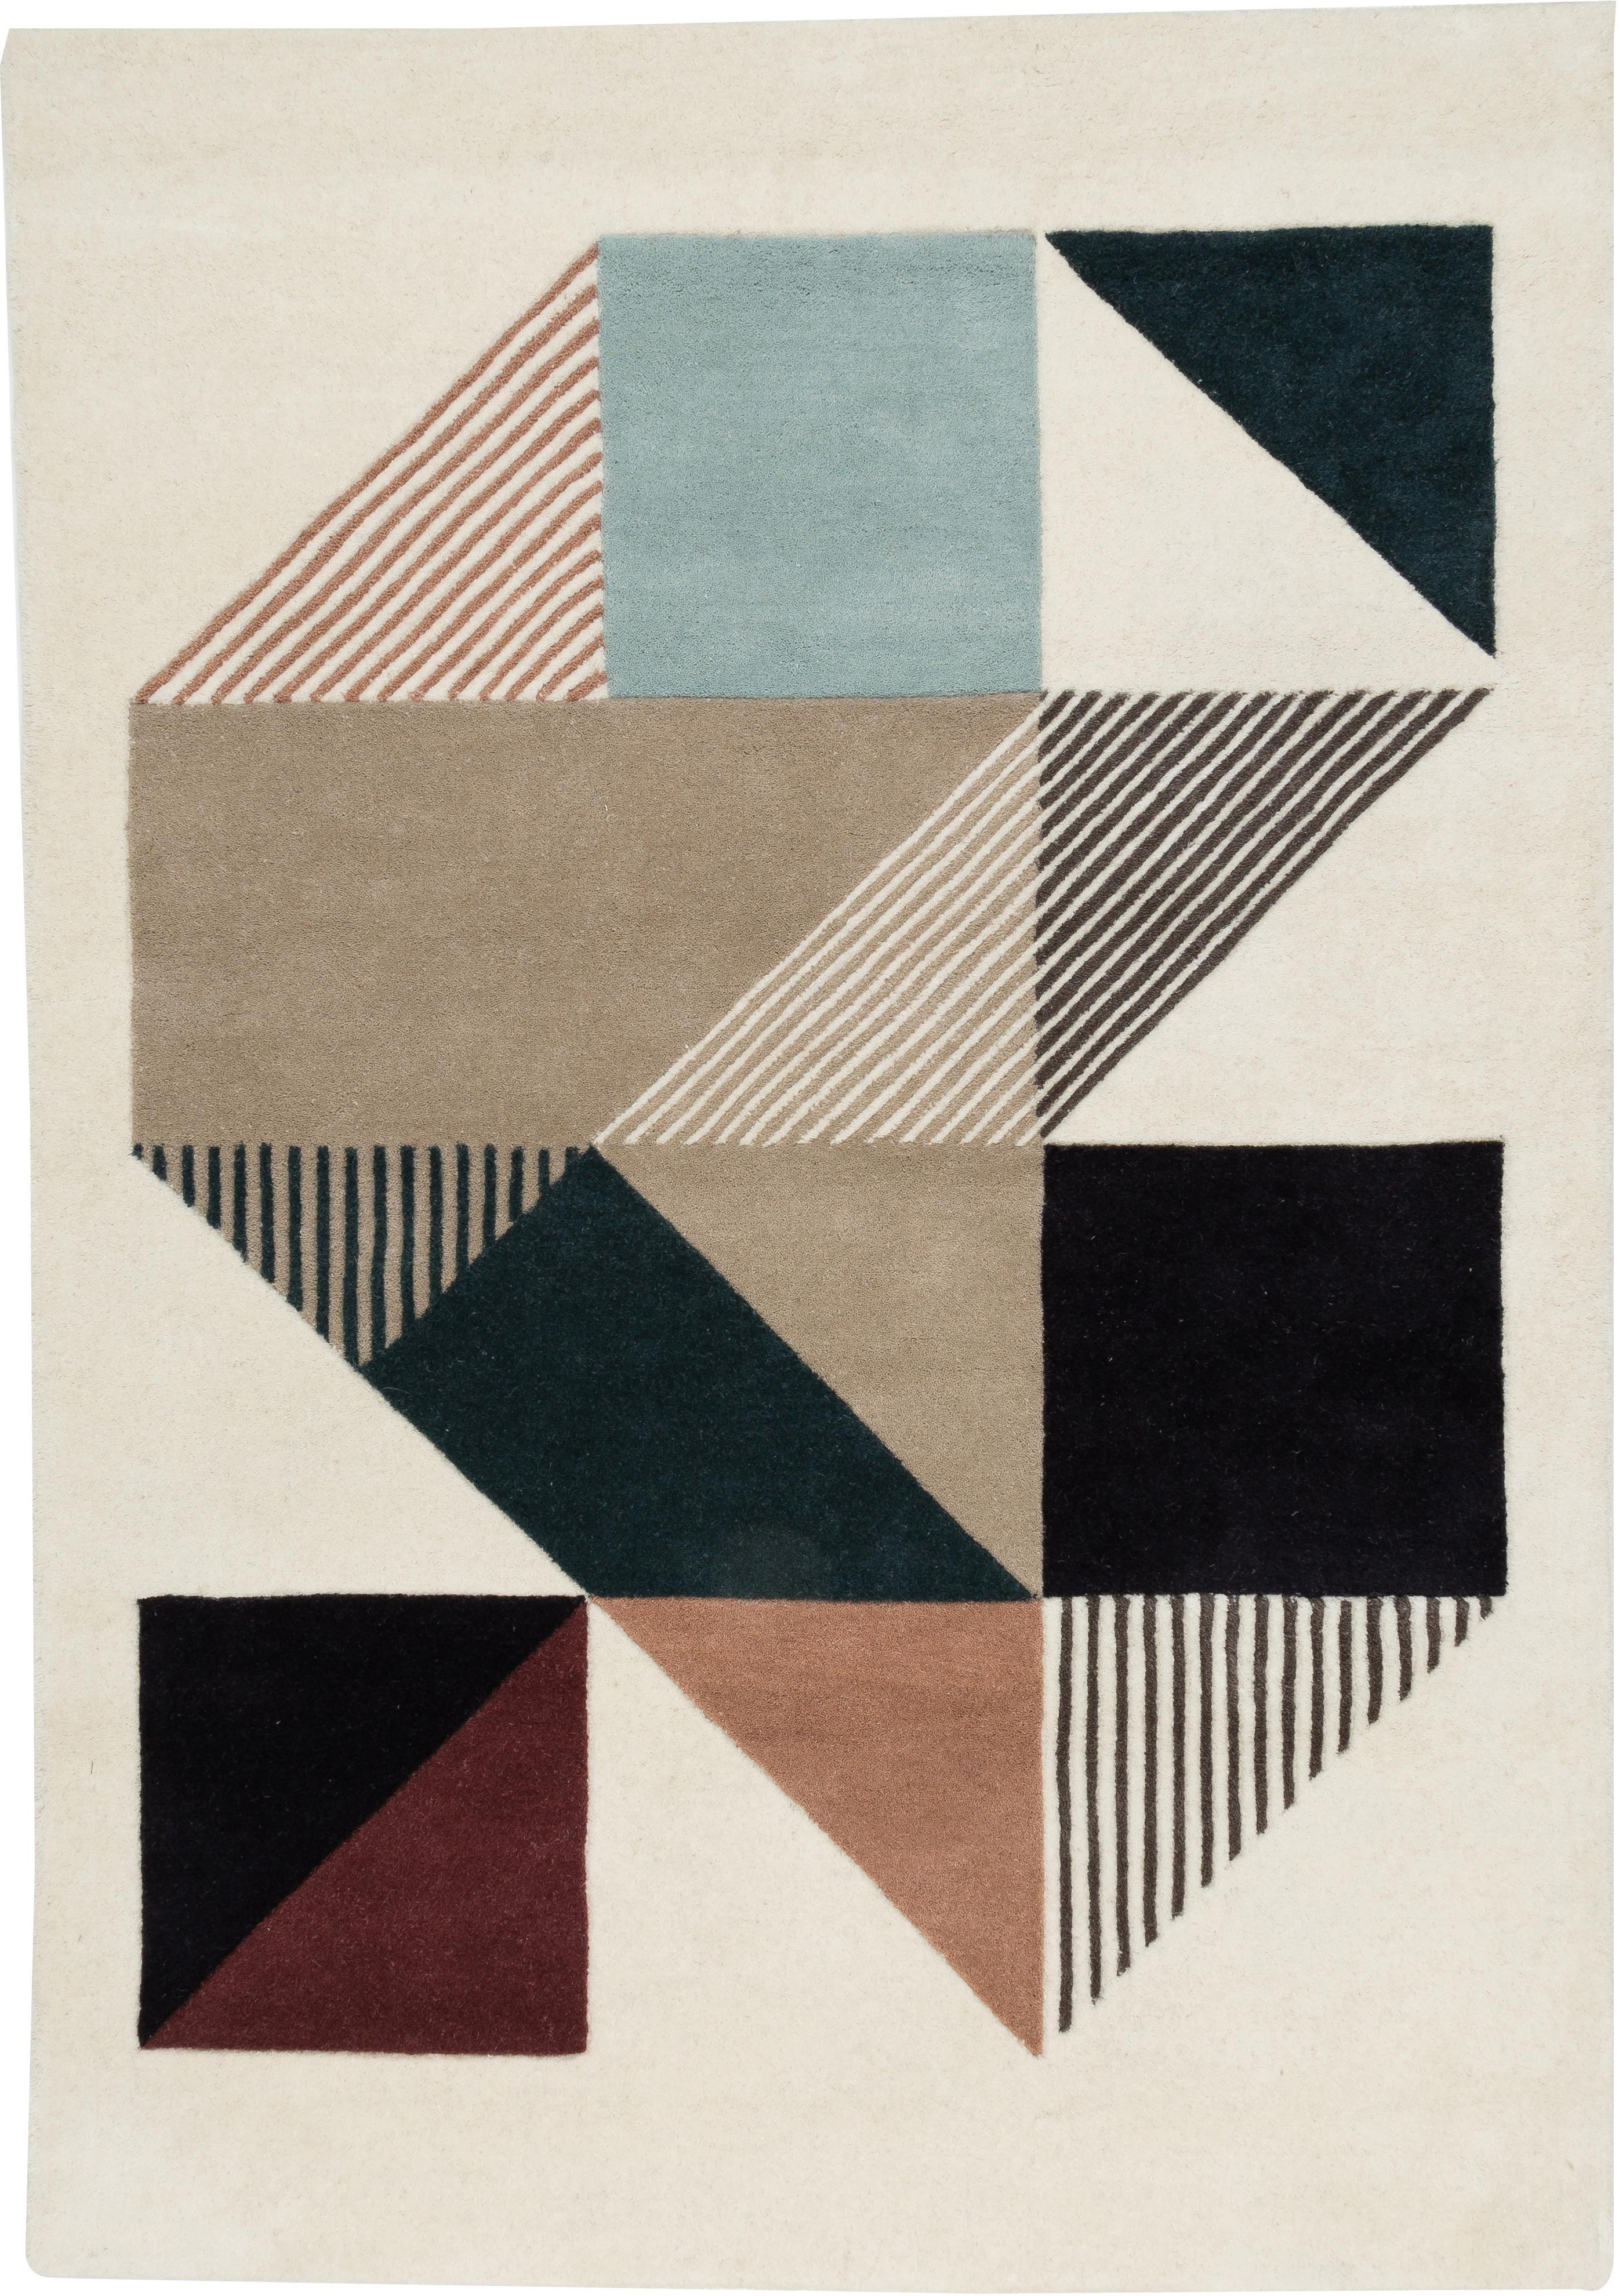 Alfombra artesanal de lana de diseño Mikill, Parte superior: 100%lana, Reverso: algodón, Tonos de beige y azul, rojo, rosa, negro, An 140 x L 200 cm (Tamaño S)